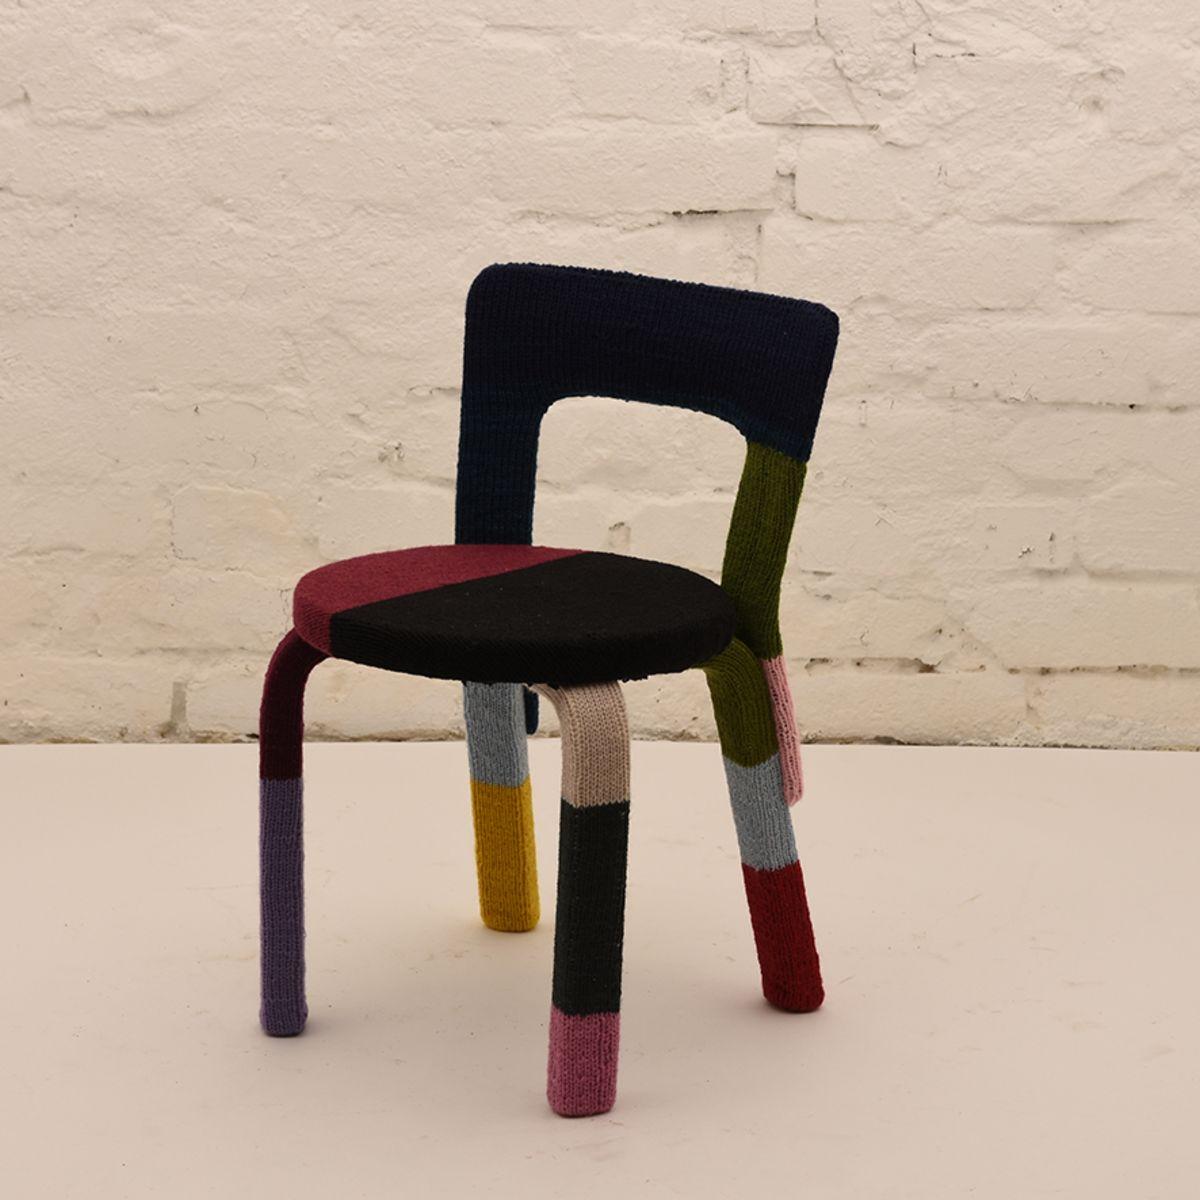 Alvar-Aalto-Eija-Zweygberg_Wool-Covered-Kid-65-Chair_A